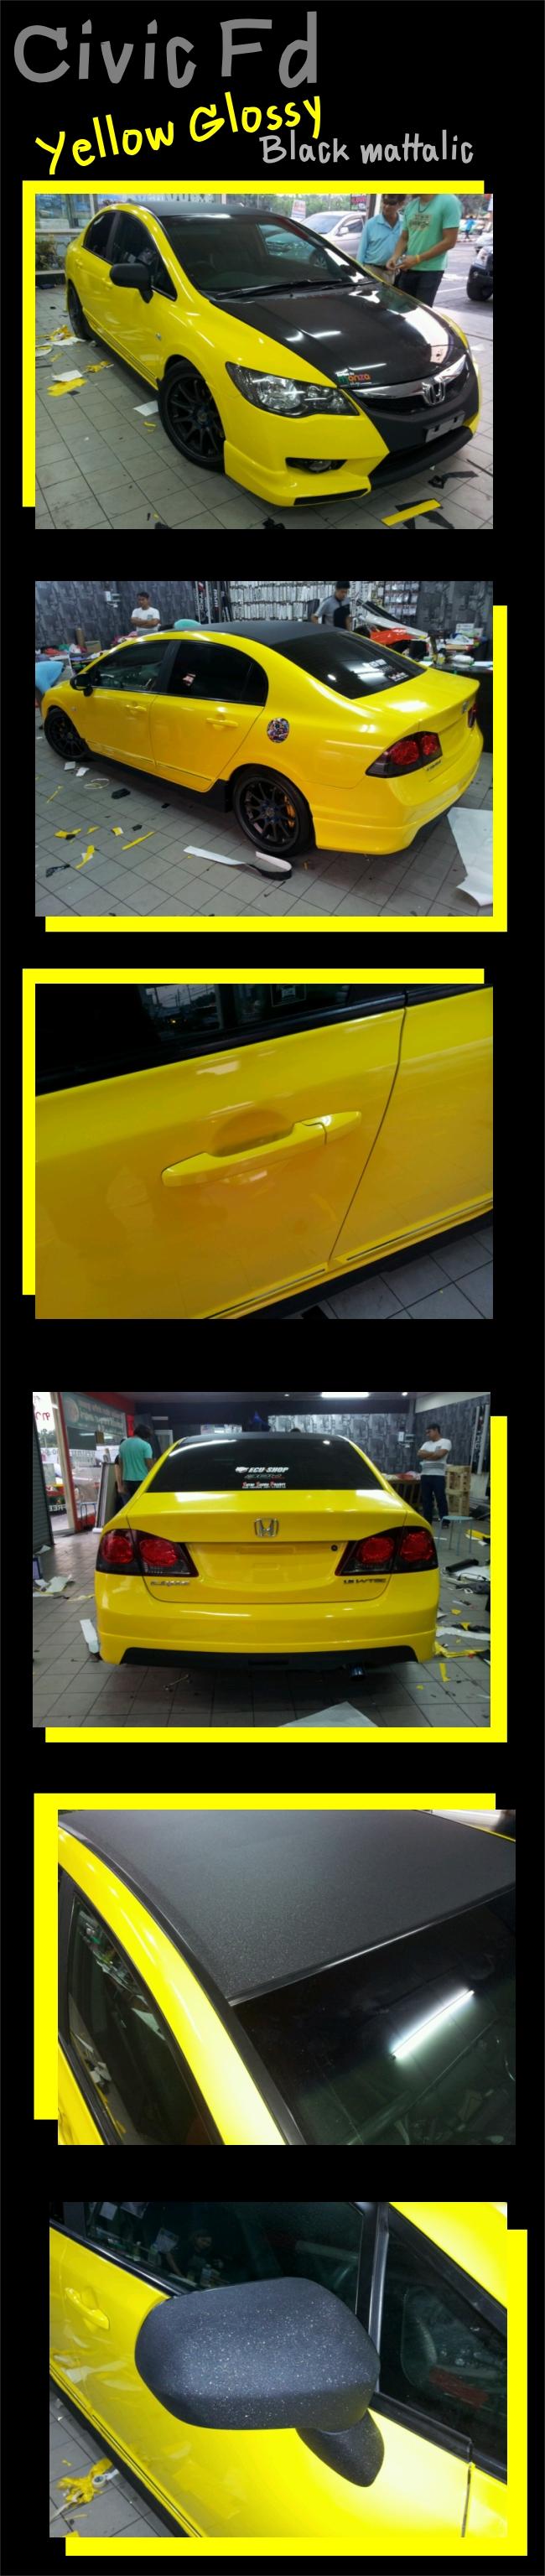 wrap car civic fd ฟิล์มหุ้มเปลี่ยนสีรถ เปลี่ยนสีรถทั้งคันด้วยสติกเกอร์ wrapเปลี่ยนสีรถ เปลี่ยนสีรถดำด้าน